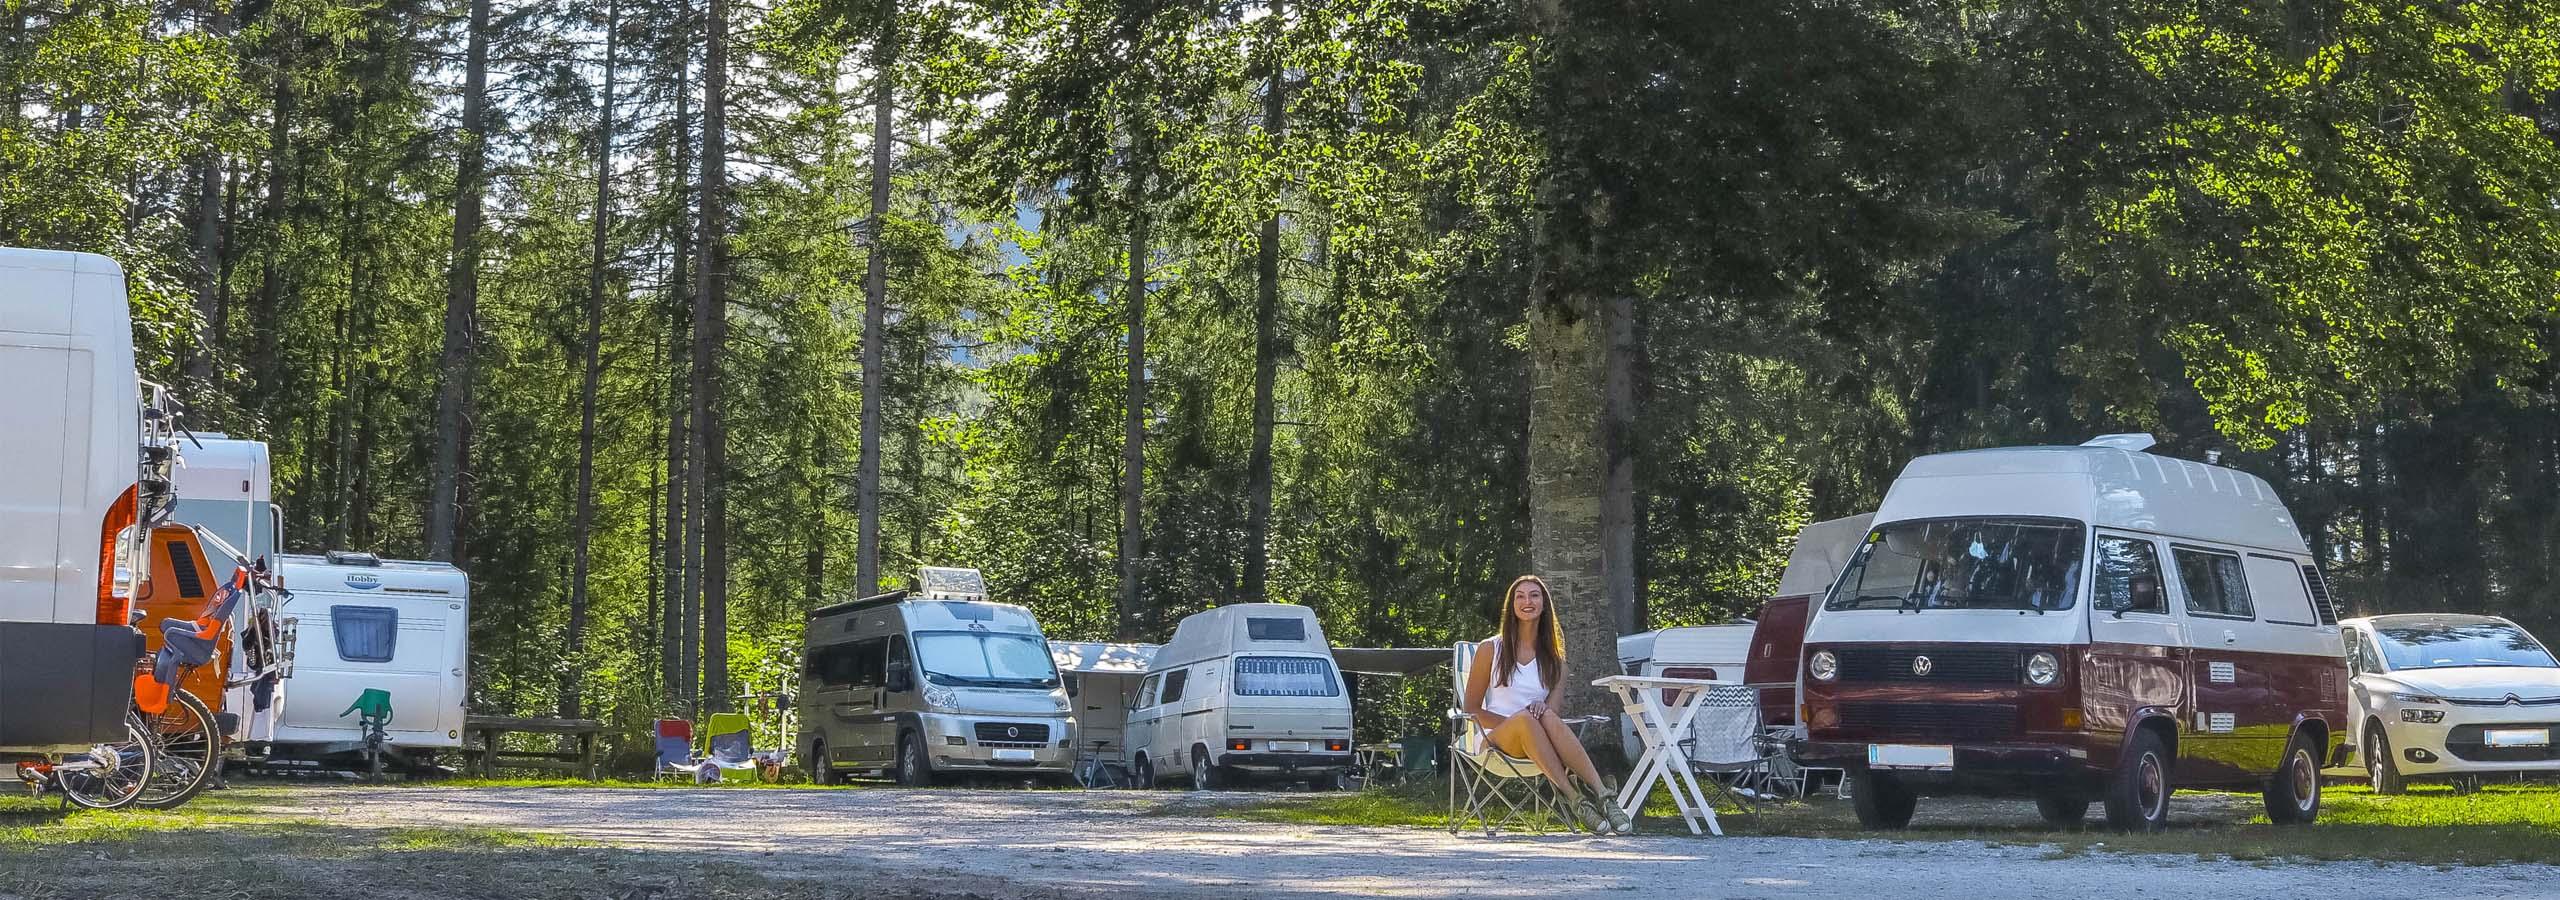 https://www.kempy-chaty.cz/sites/default/files/novinky/camping_erlaufsee_karavany_stany.jpg